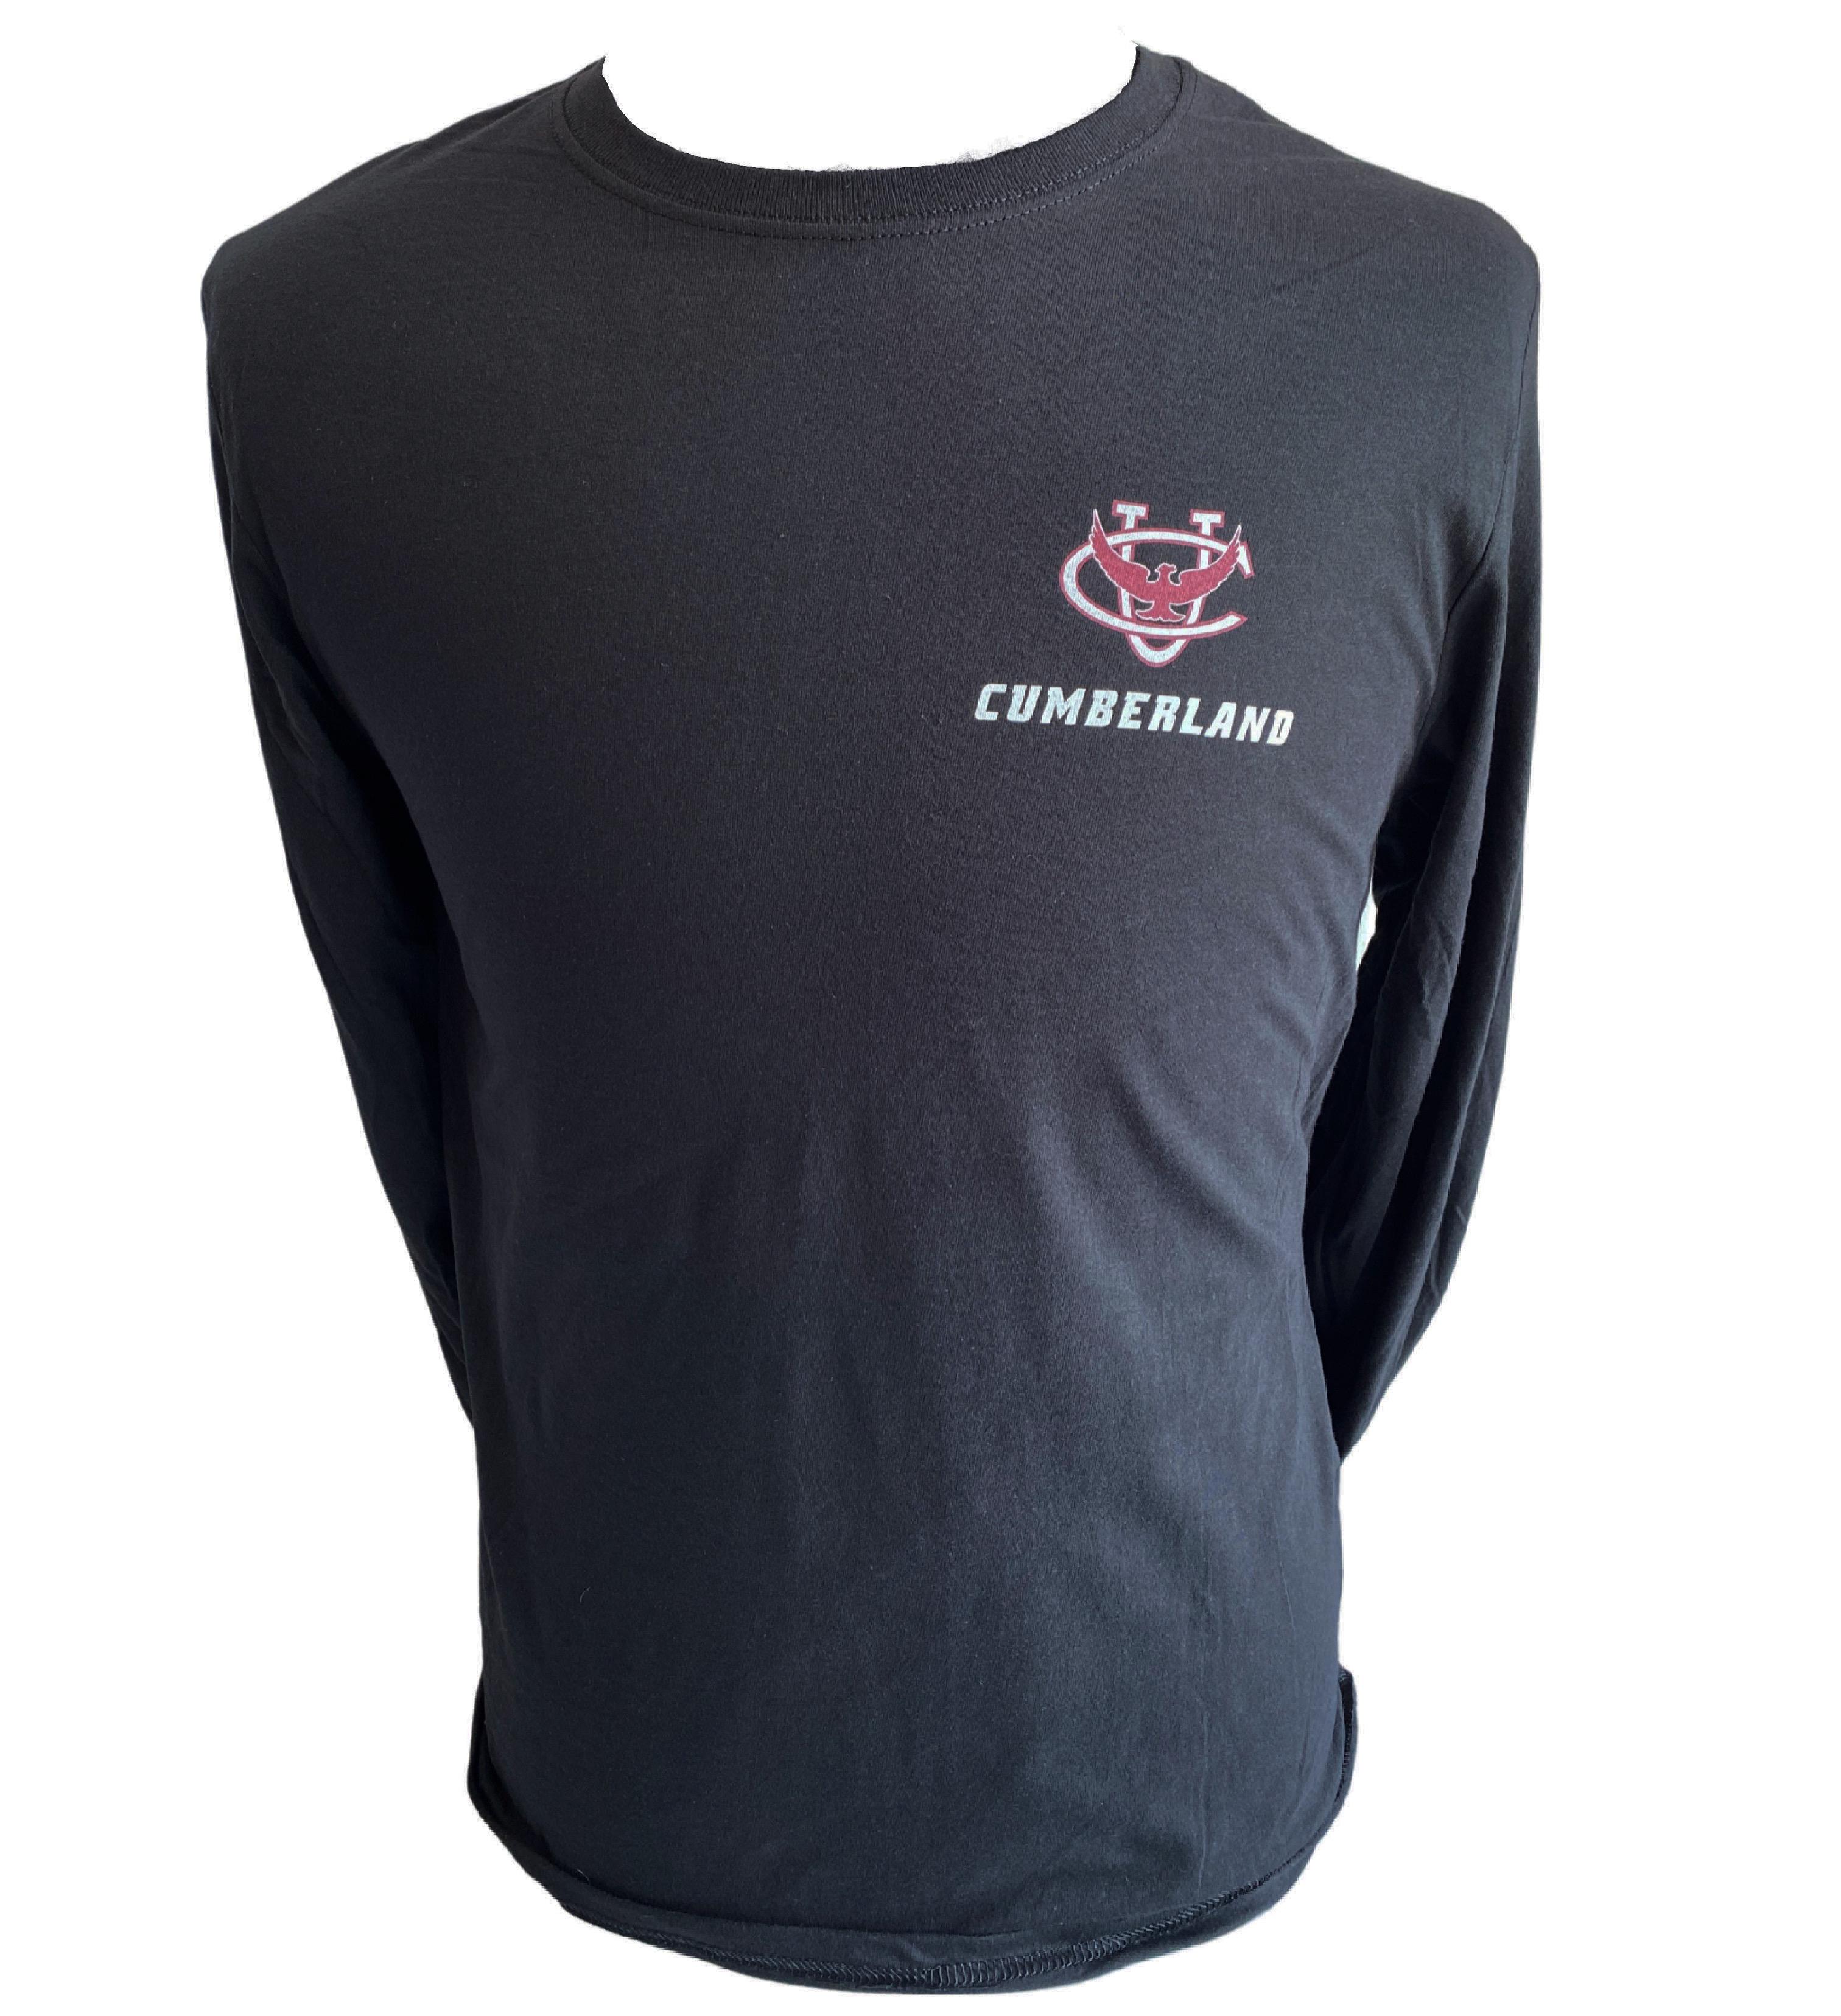 CU Cumberland Long Sleeve Shirt